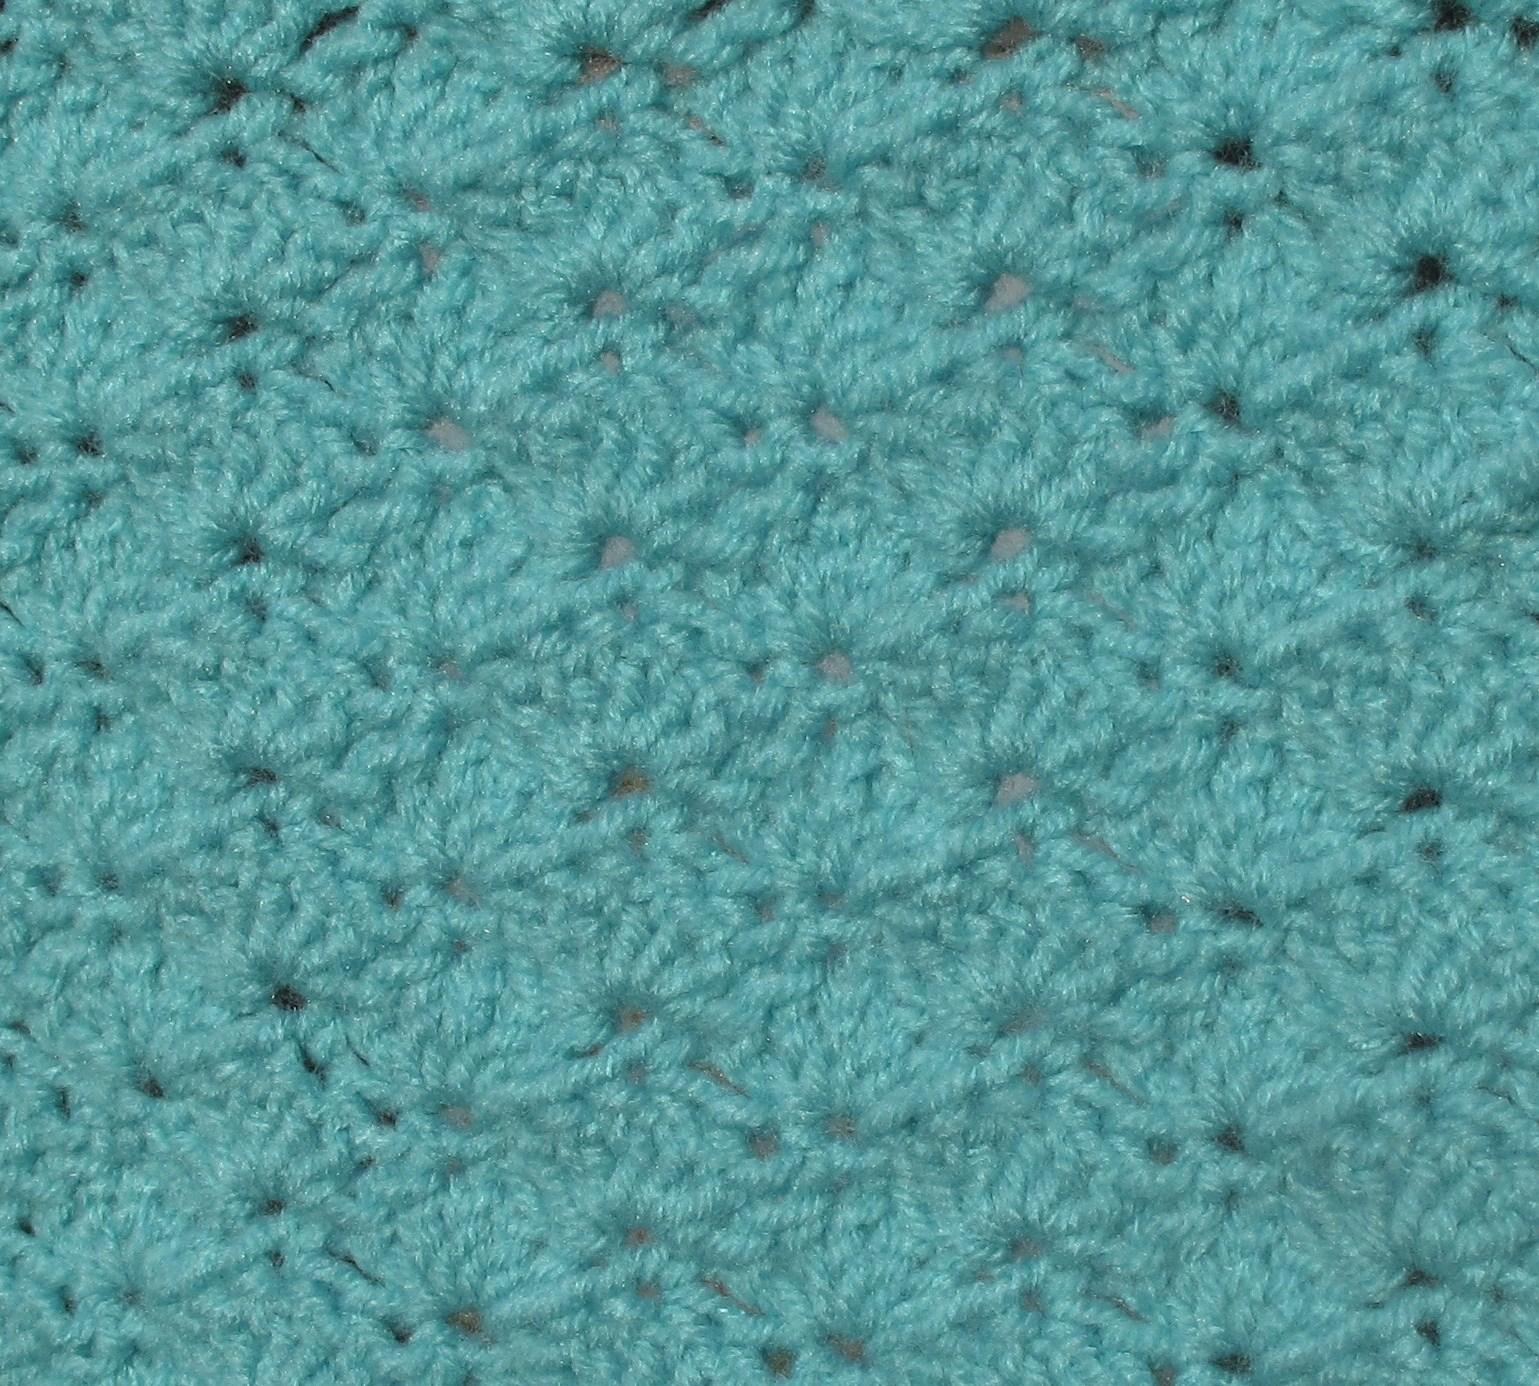 Crochet Patterns Shell : CROCHET CASE PATTERN Crochet Patterns